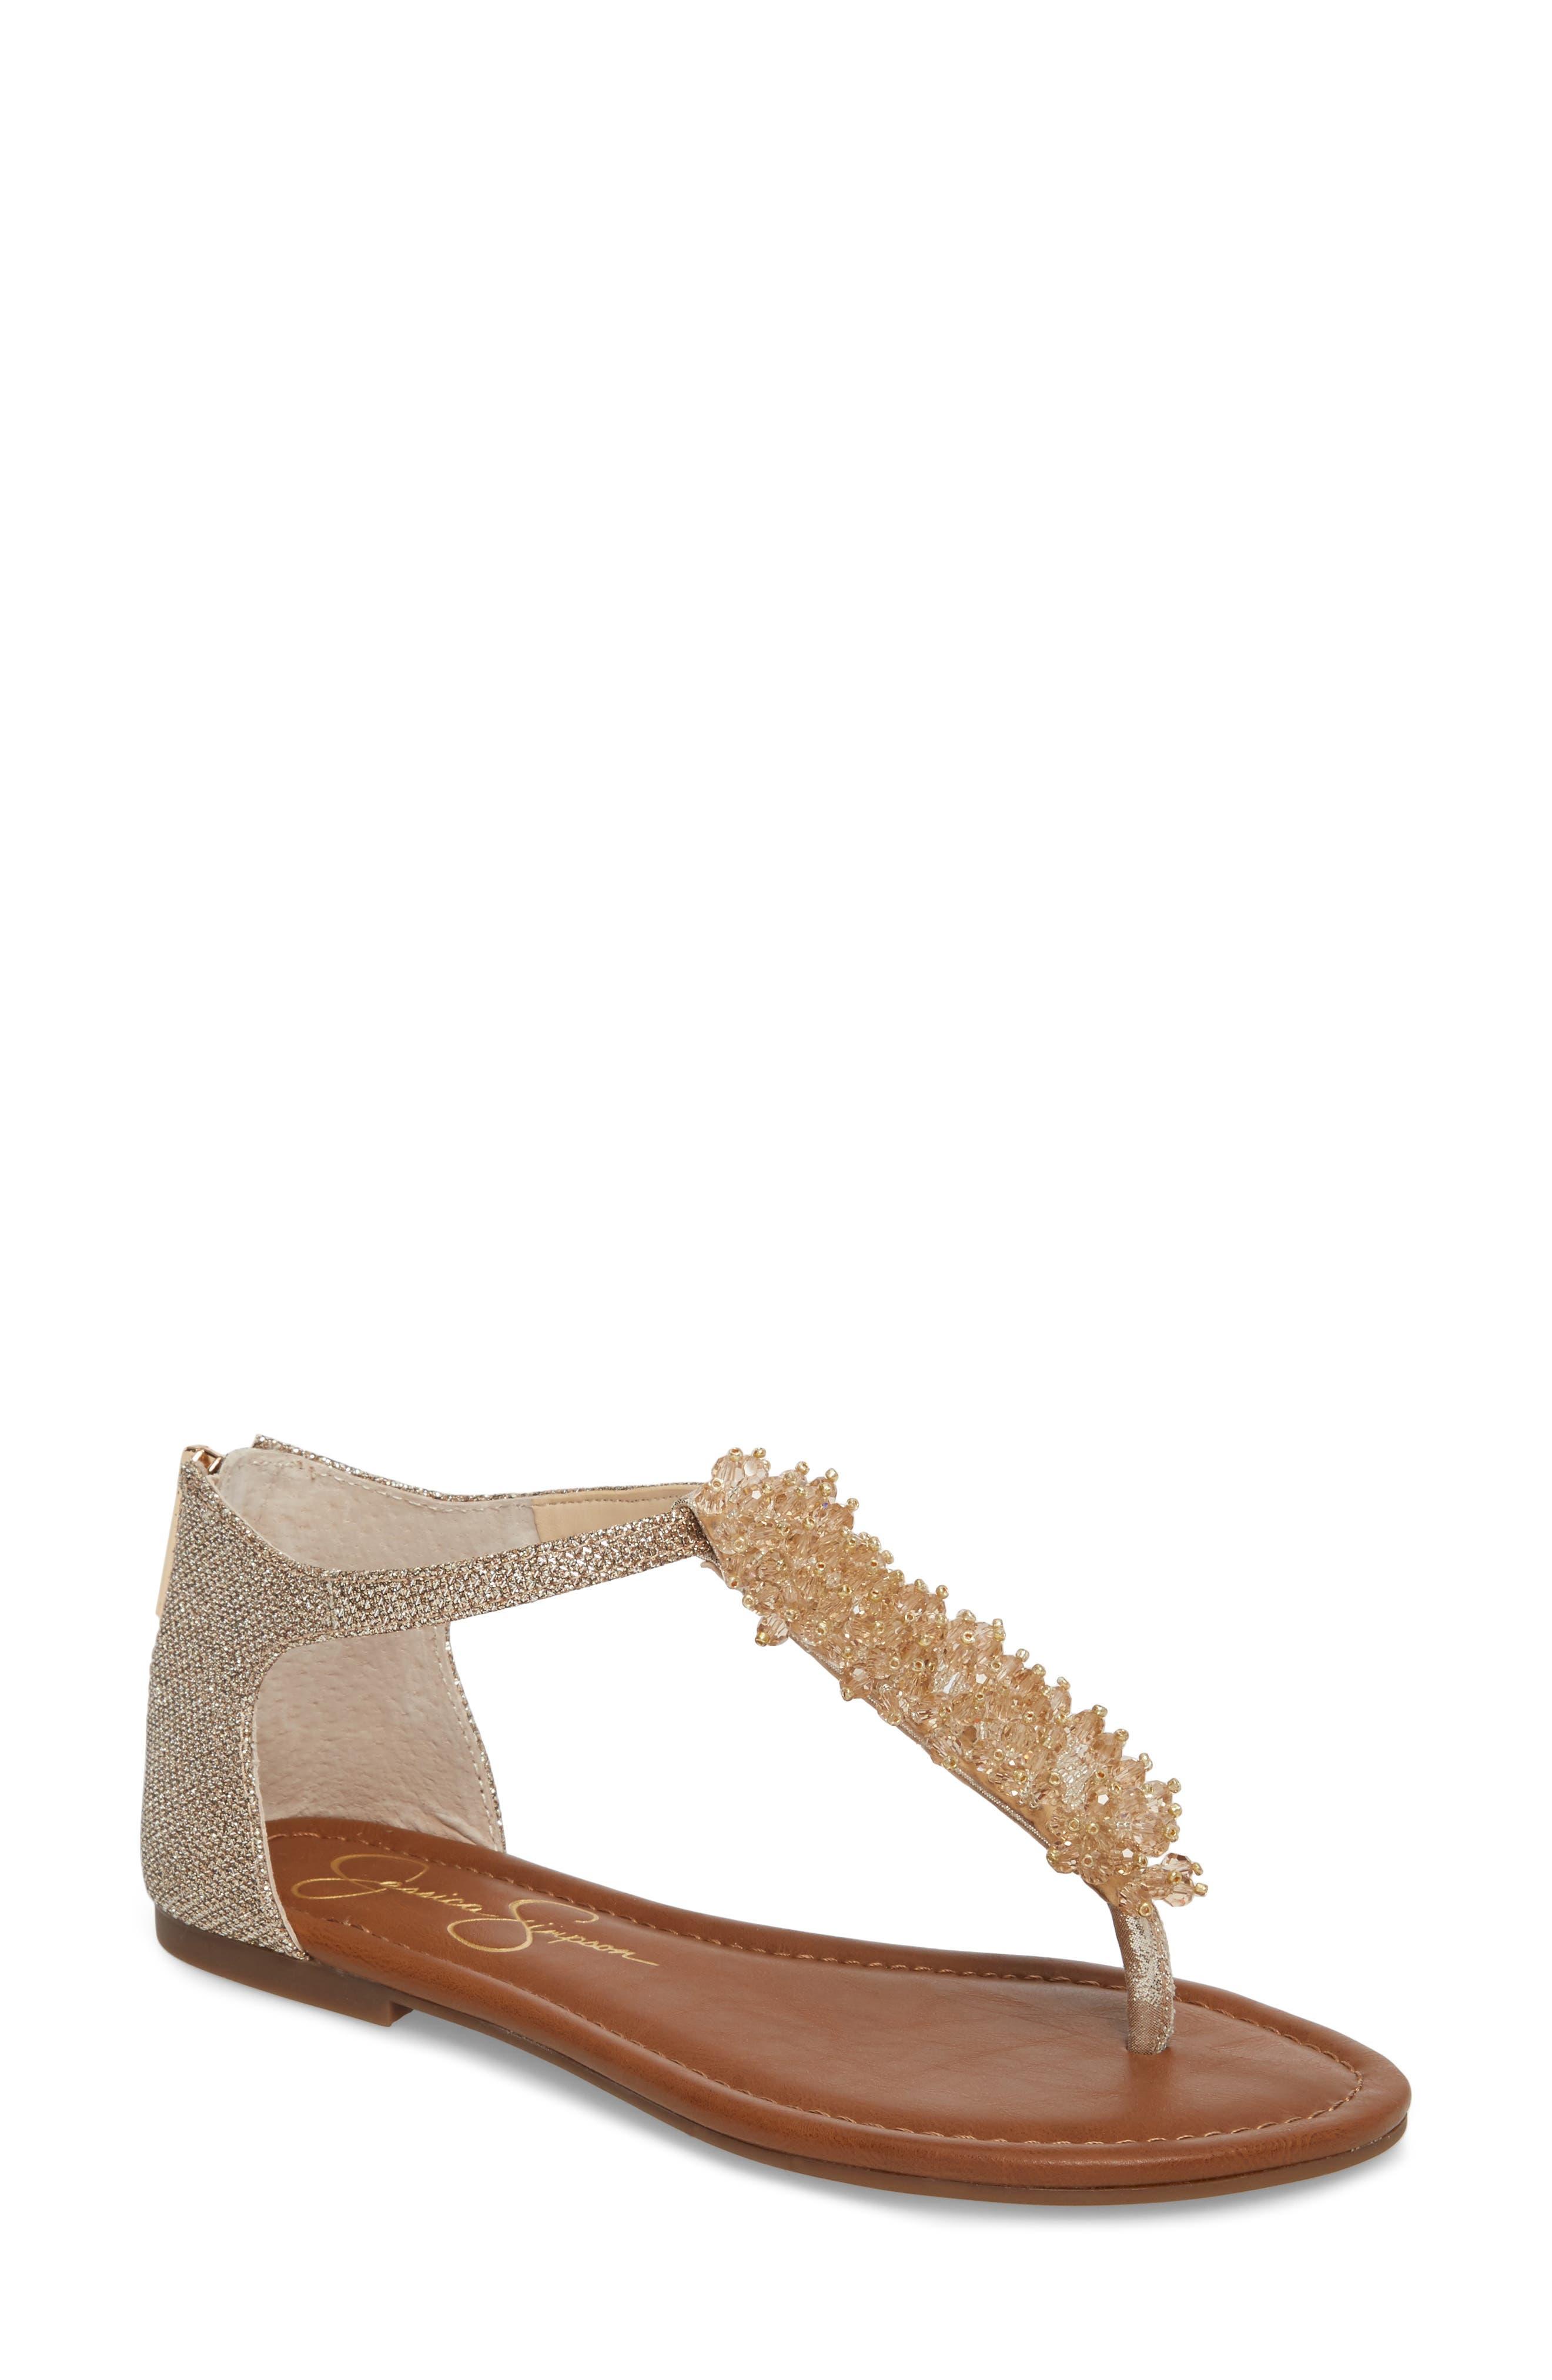 Kenton Crystal Embellished Sandal,                             Main thumbnail 1, color,                             Gold